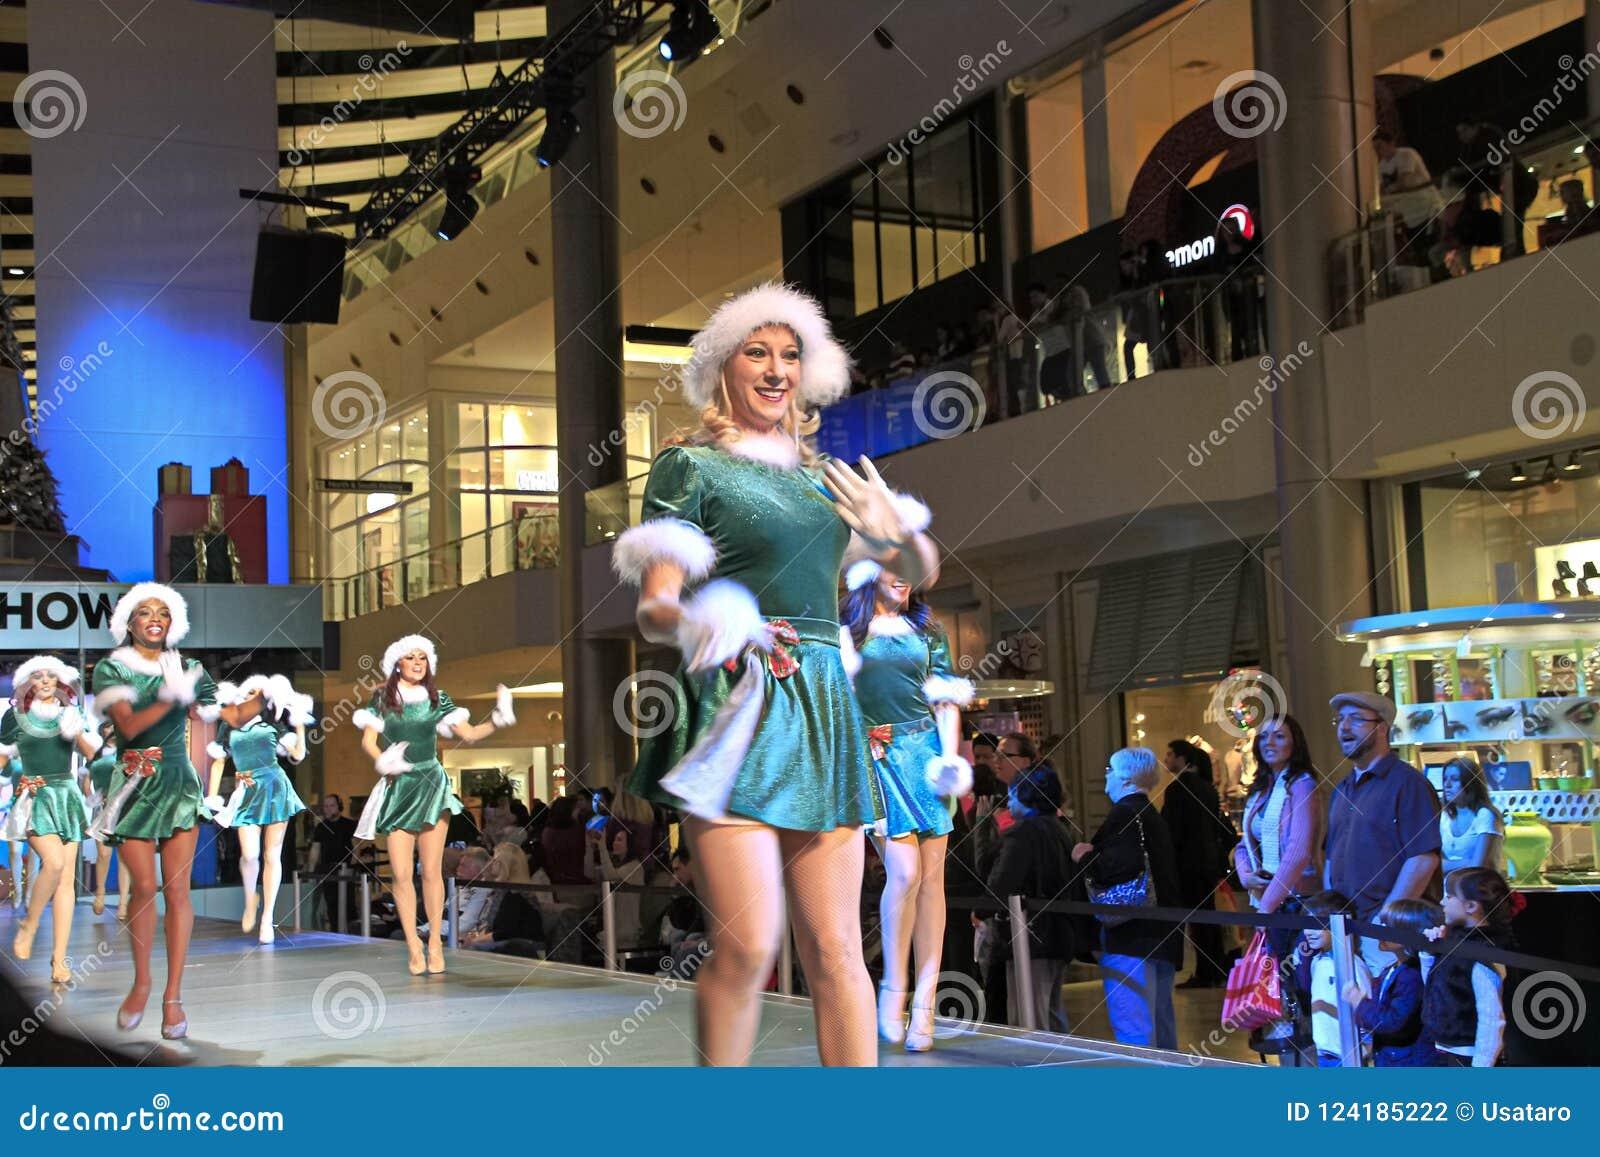 Christmas Show Dancer Editorial Photography Image Of Fashion 124185222